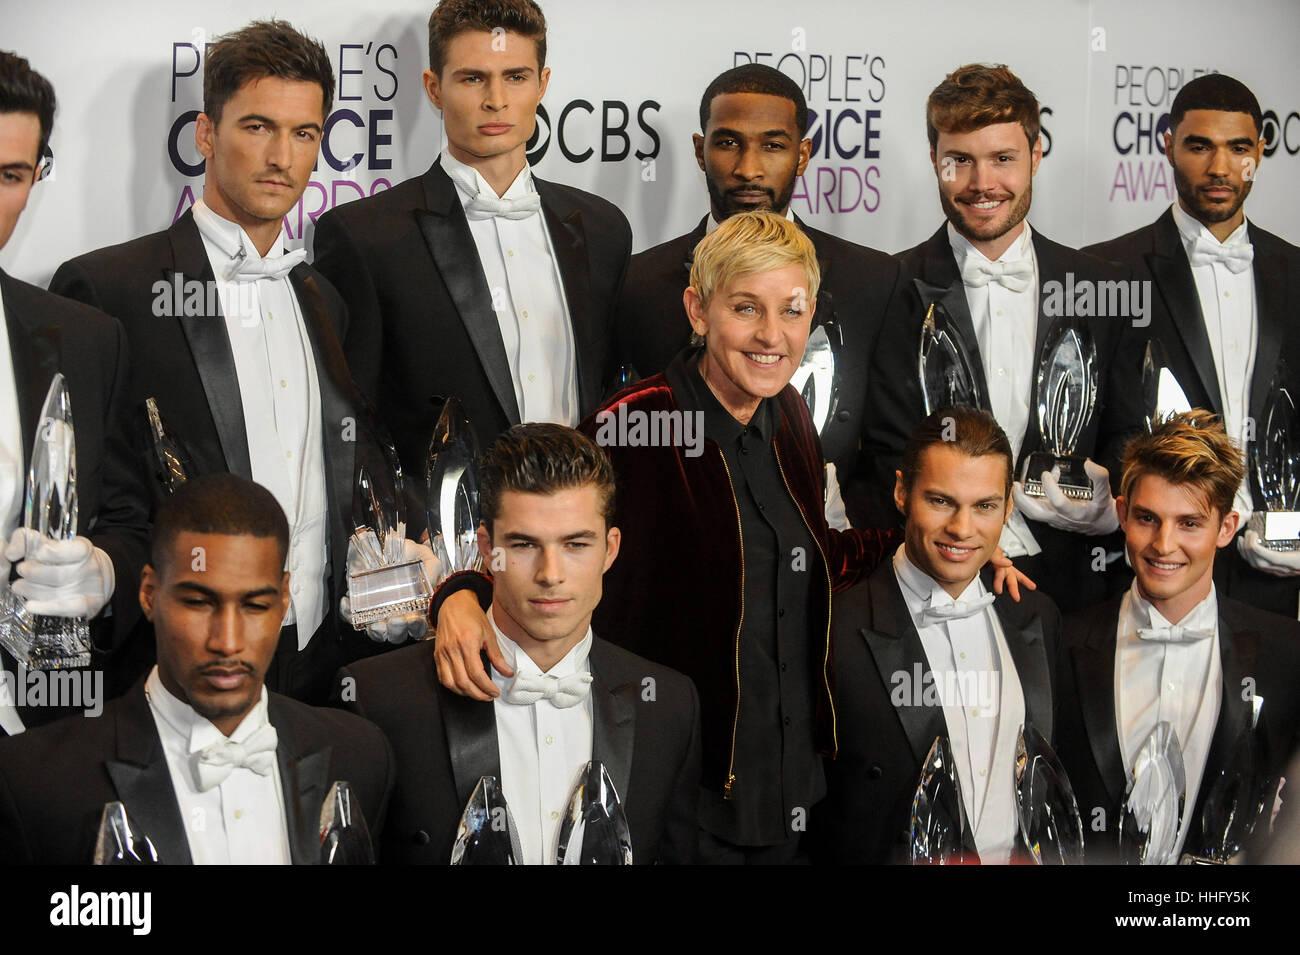 Los Angeles, USA. 18. Januar 2017. Ellen DeGeneres (C), Gewinner des Lieblings Daytime TV-Moderatorin, Favorite Stockfoto